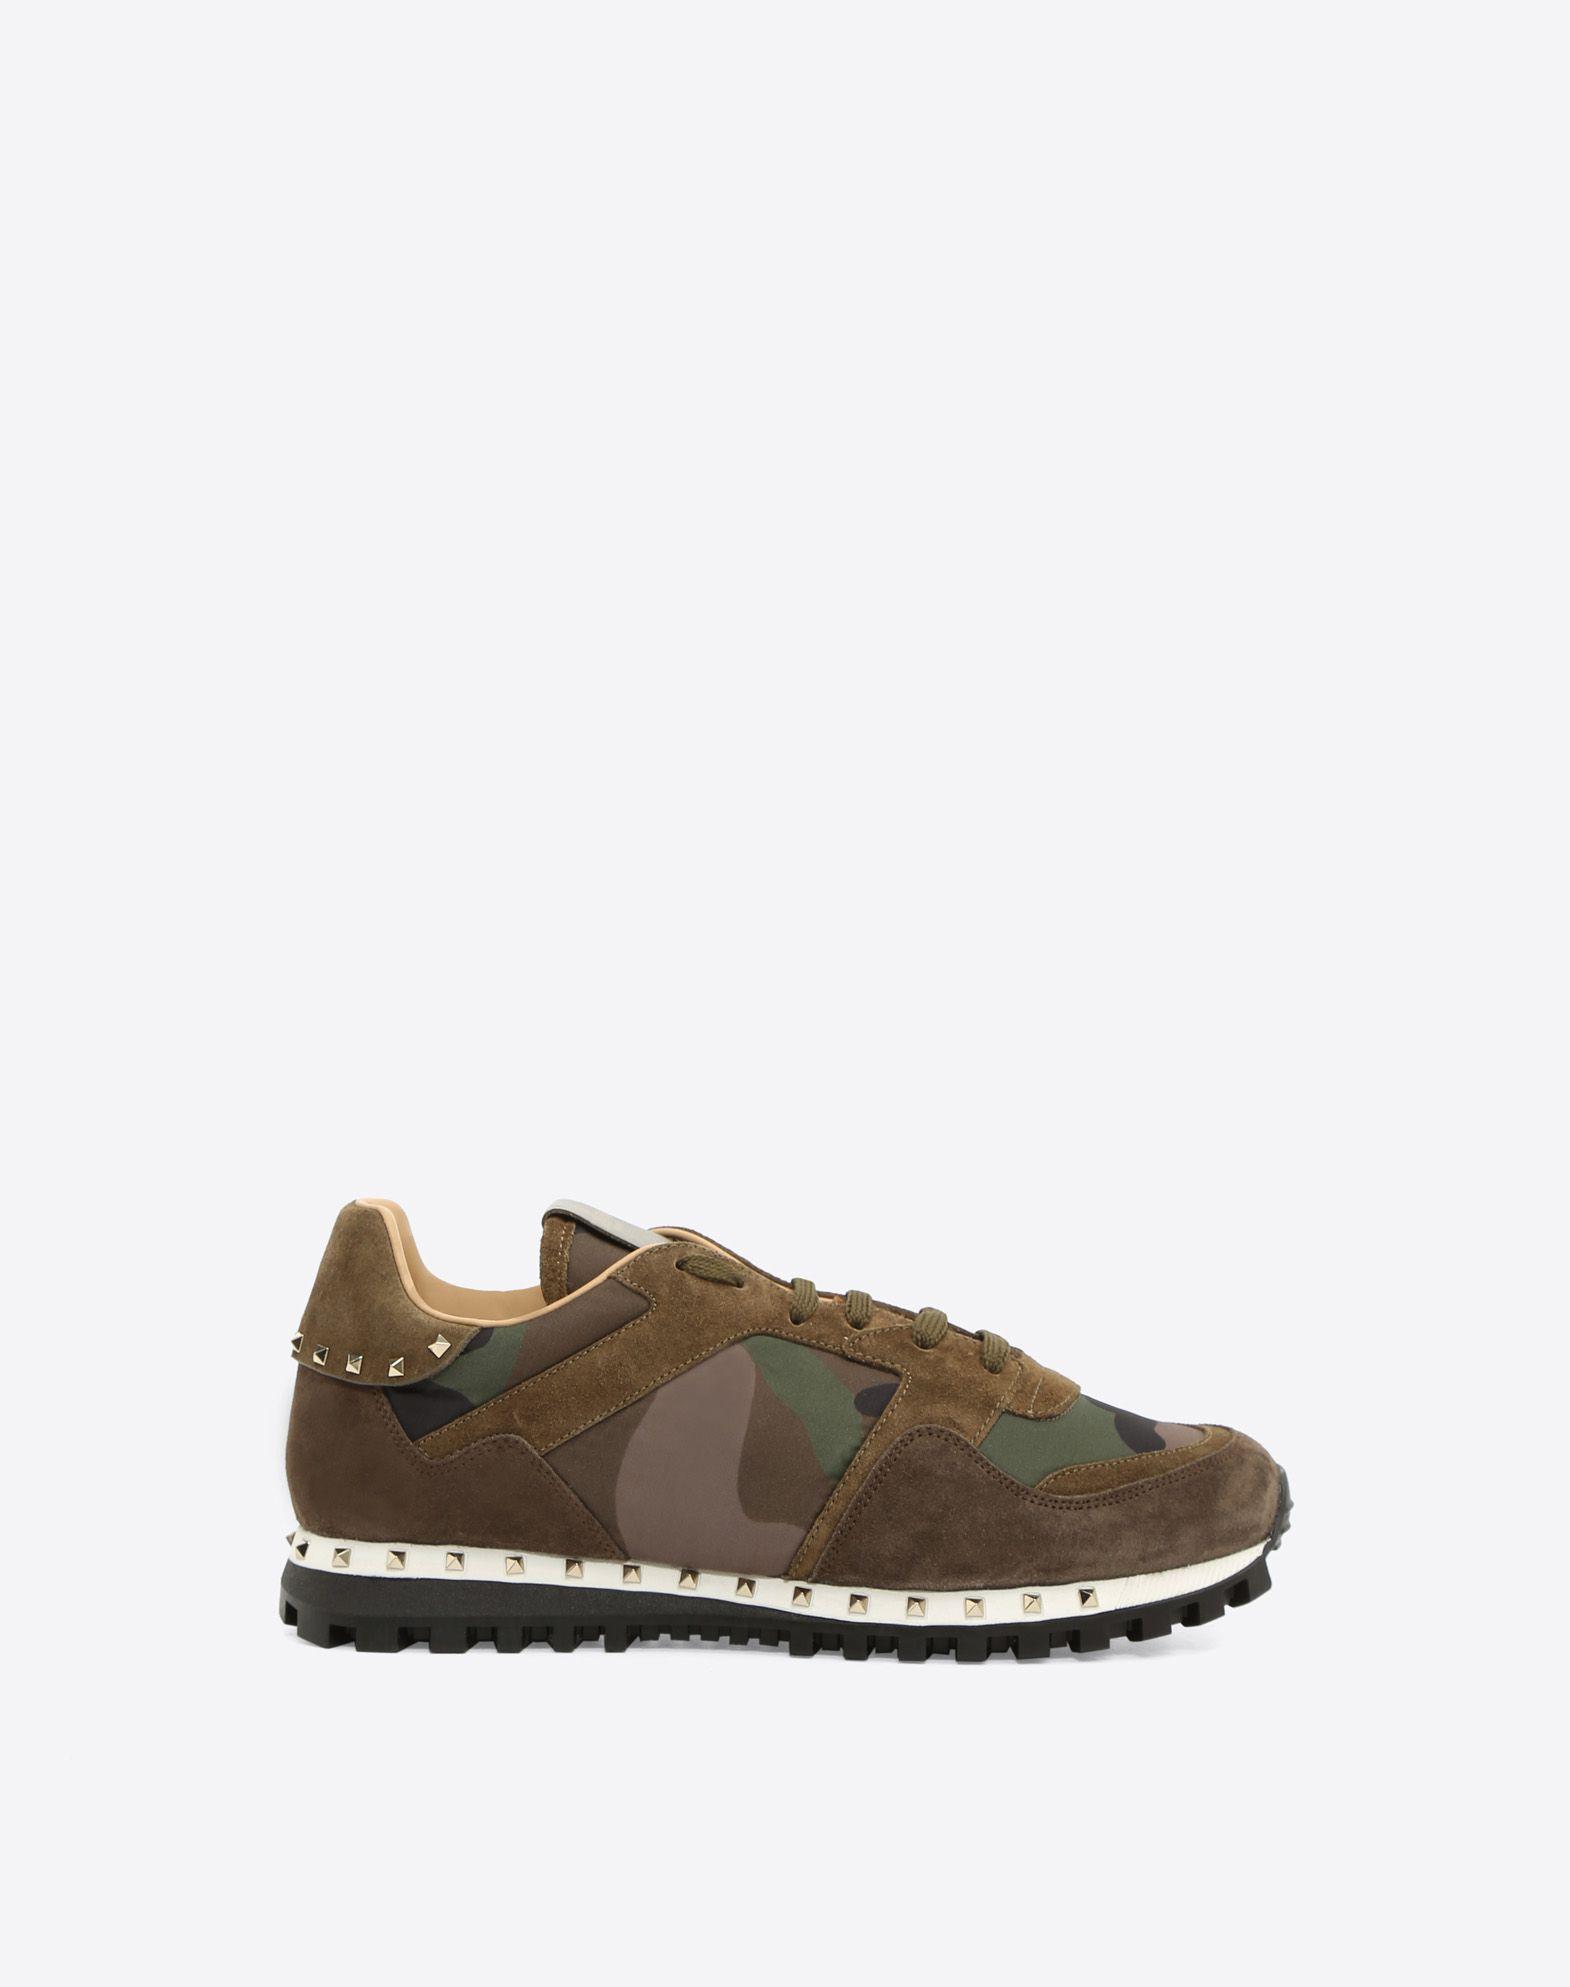 VALENTINO GARAVANI UOMO Camouflage Sneaker LOW-TOP SNEAKERS U f